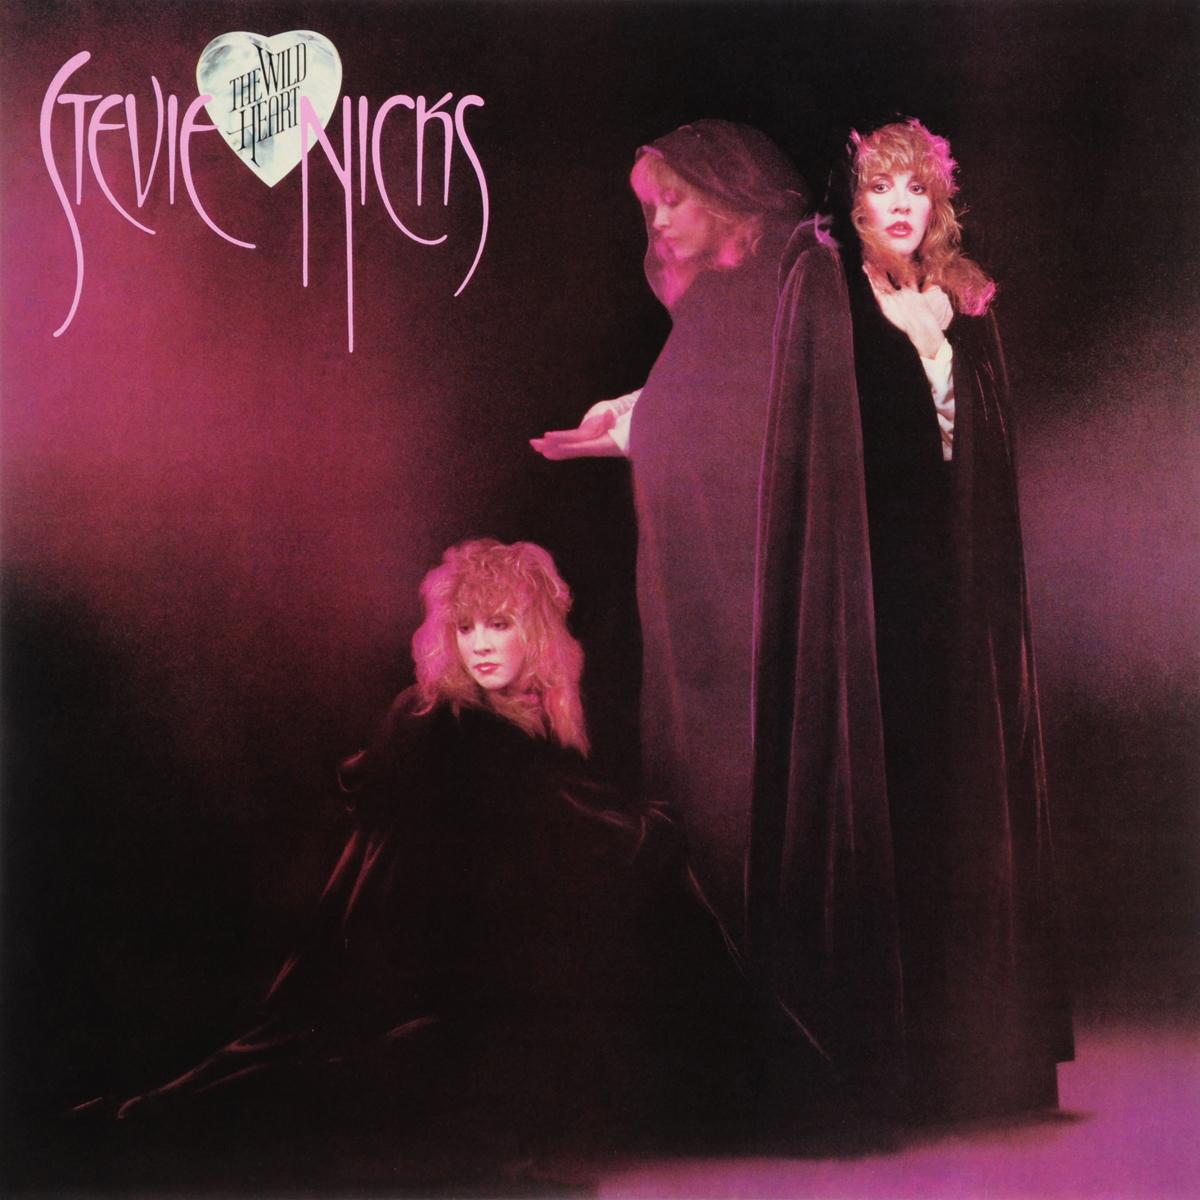 Стиви Никс Stevie Nicks. The Wild Heart (LP) air heads игрушка hog wild stevie